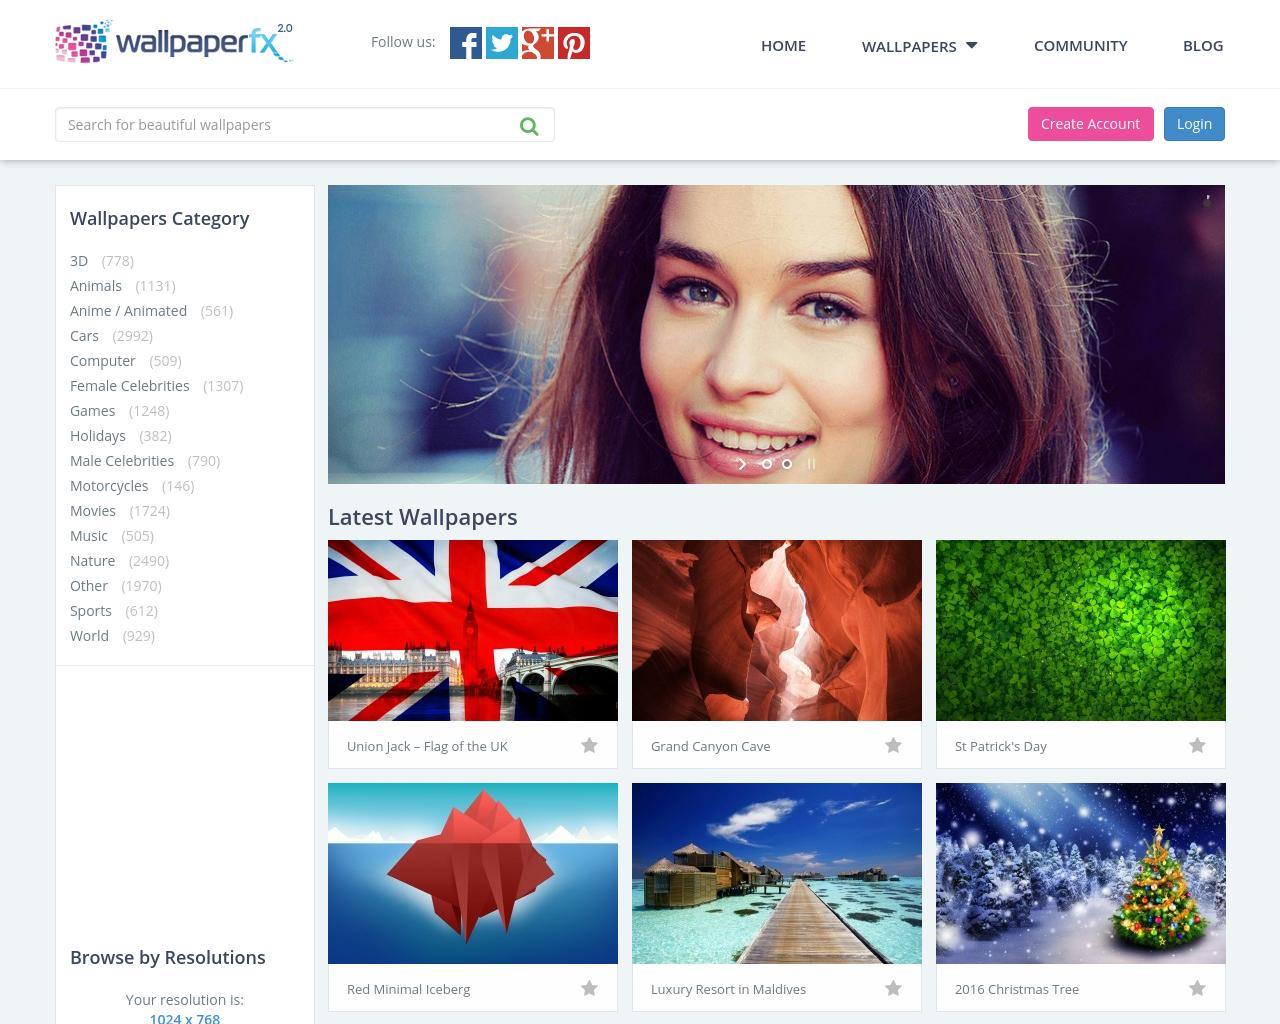 WallpaperFX-Advertising-Reviews-Pricing